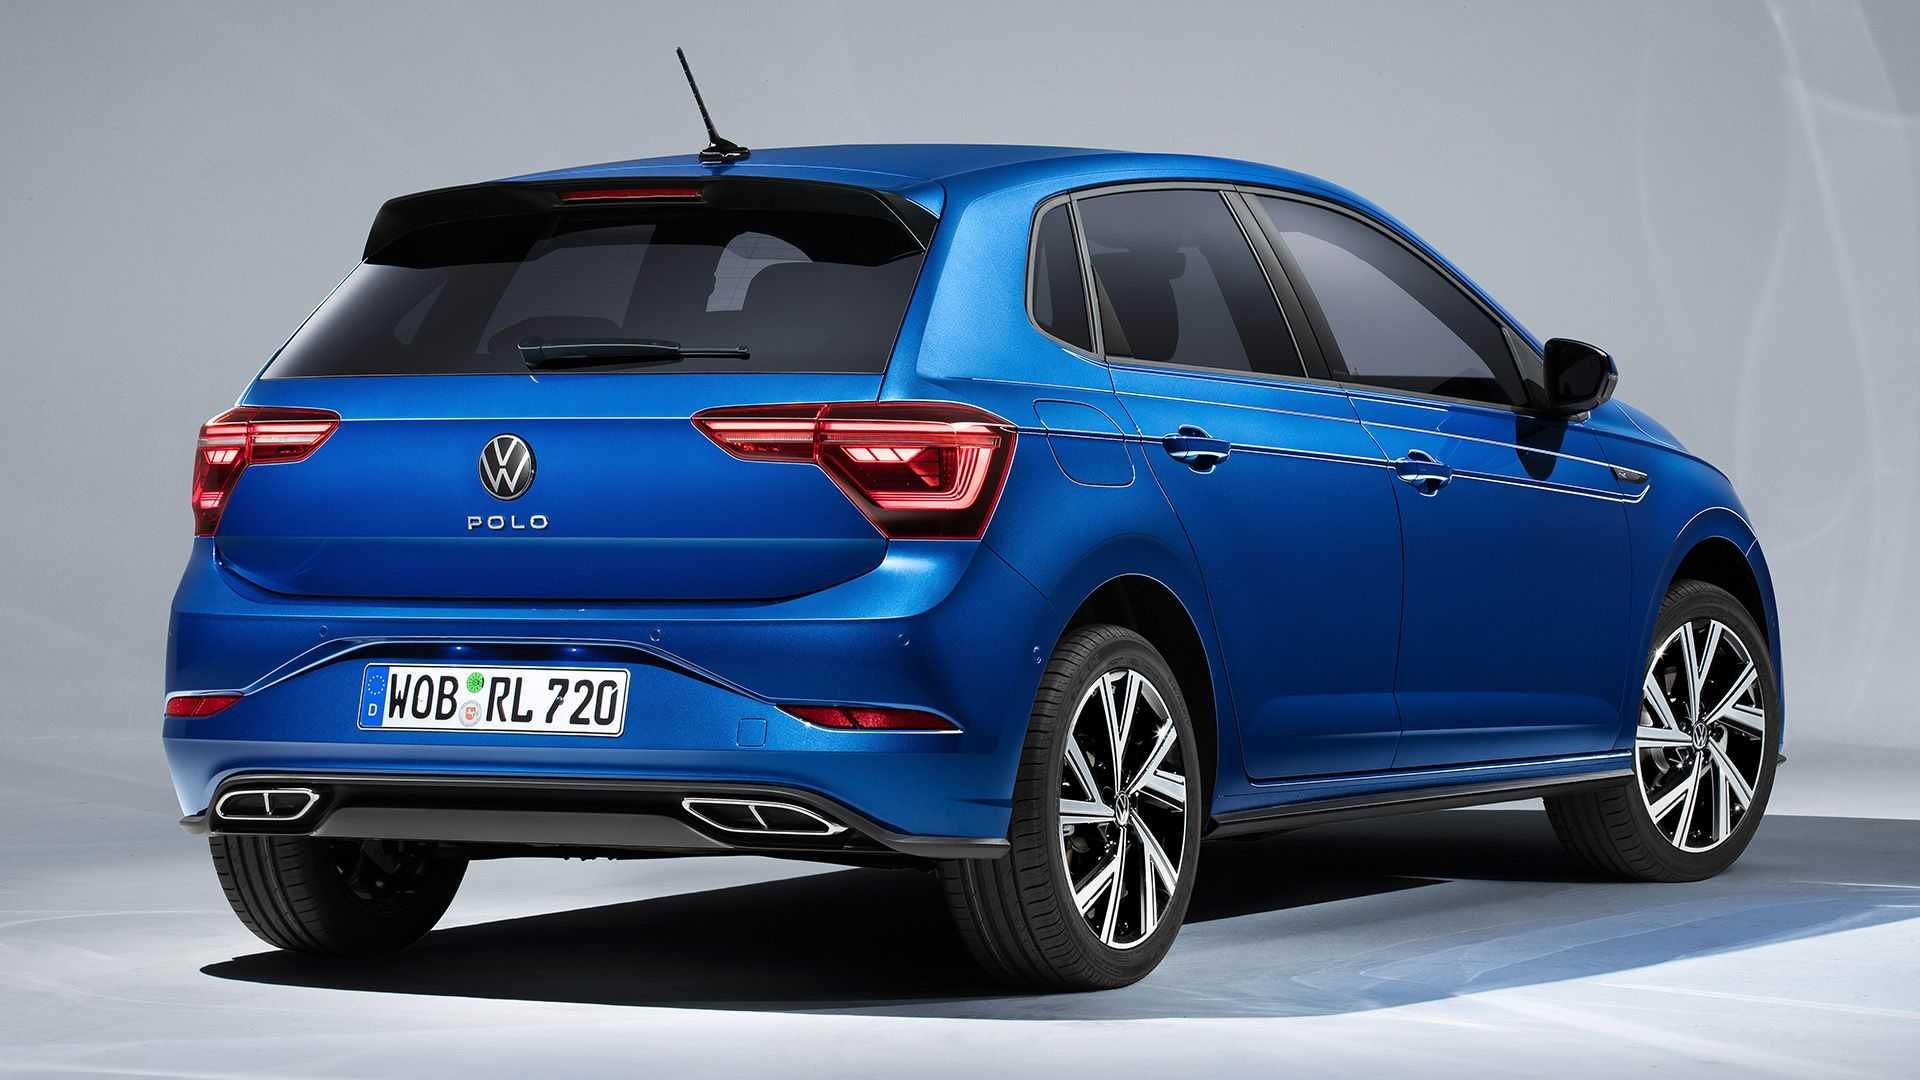 Volkswagen-Polo-facelift-3